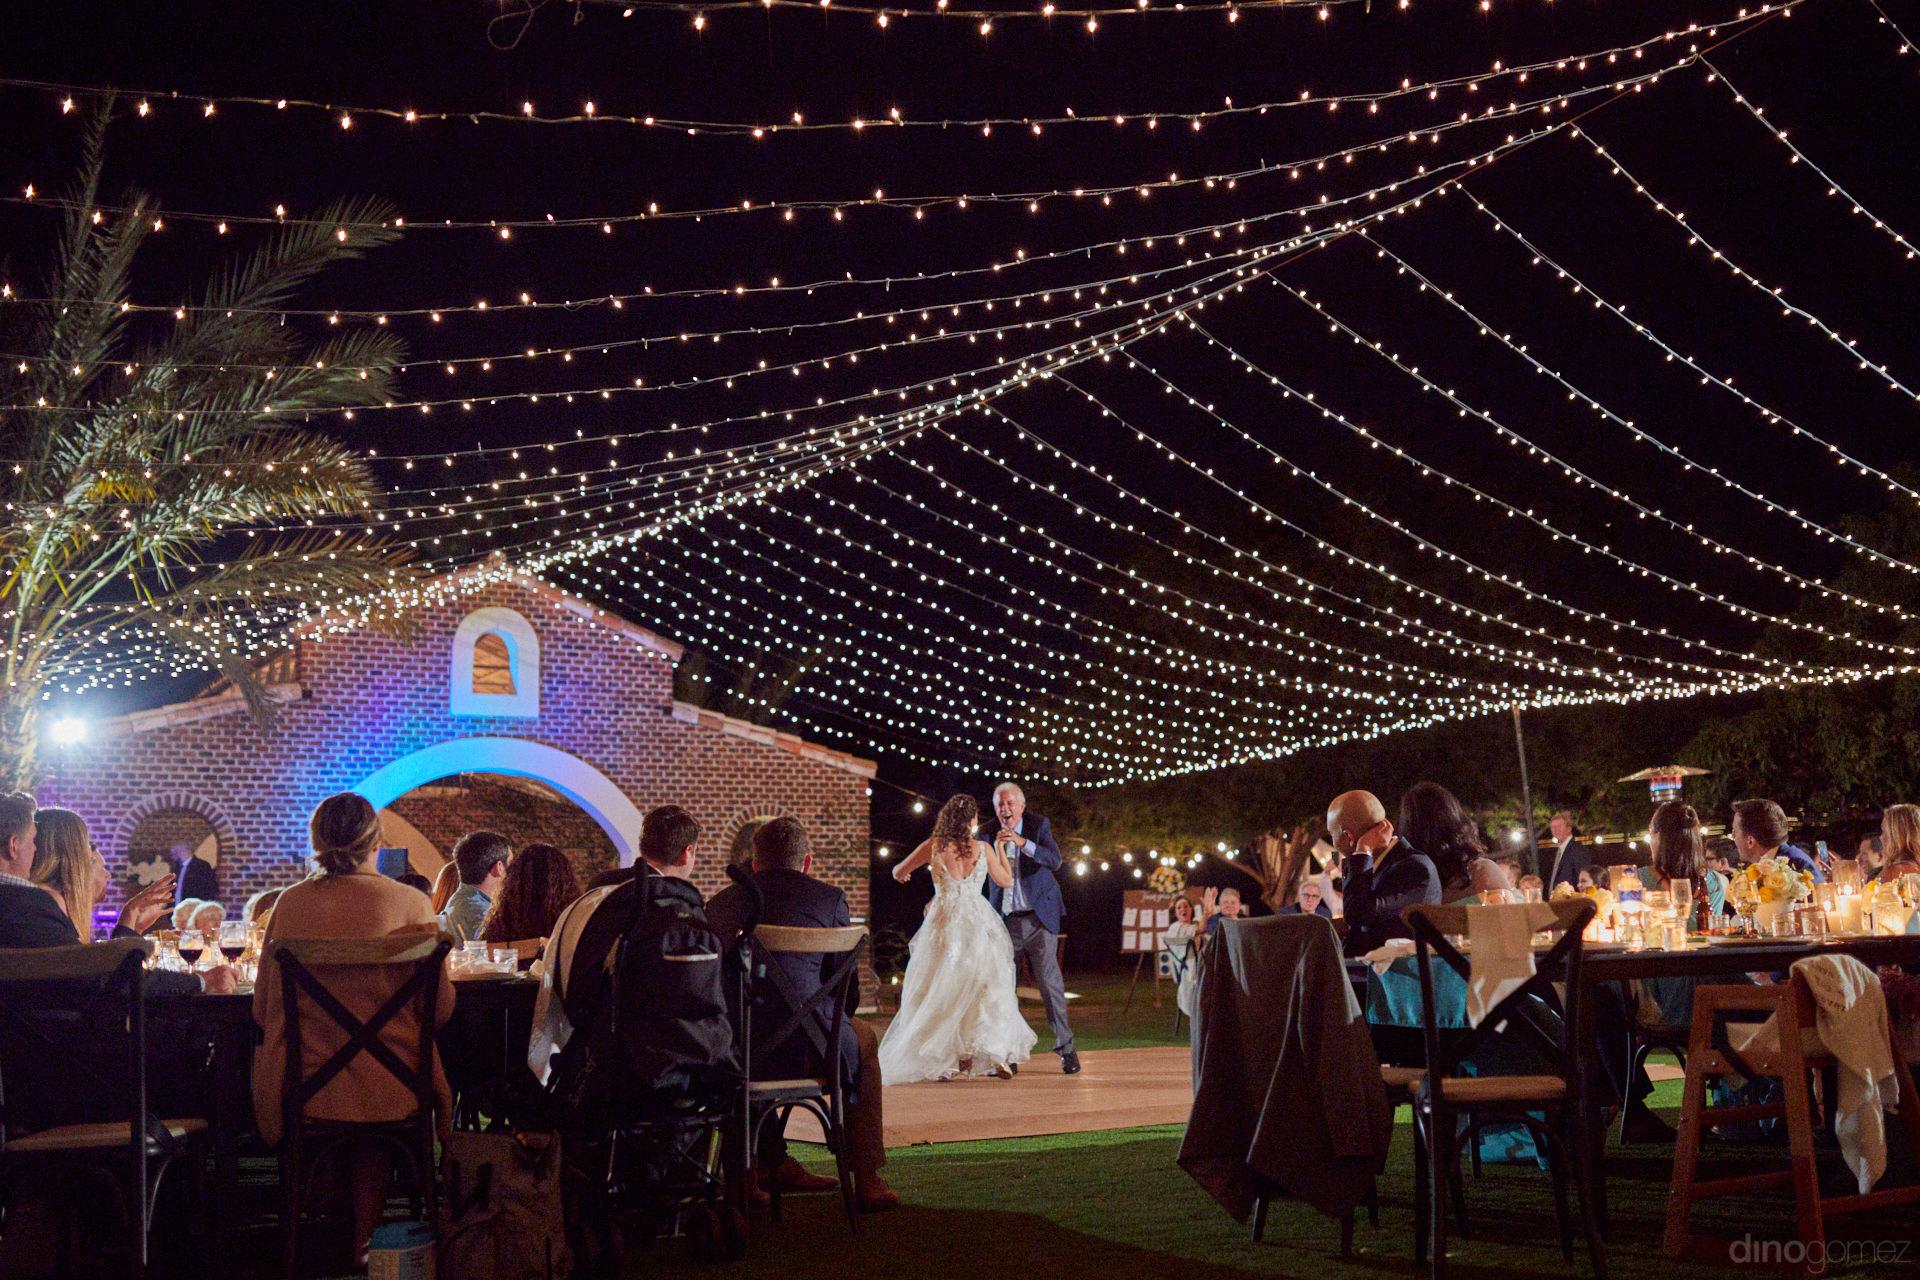 Cabo Photographers For Weddings - Hilary & Bryan Flora Wedding